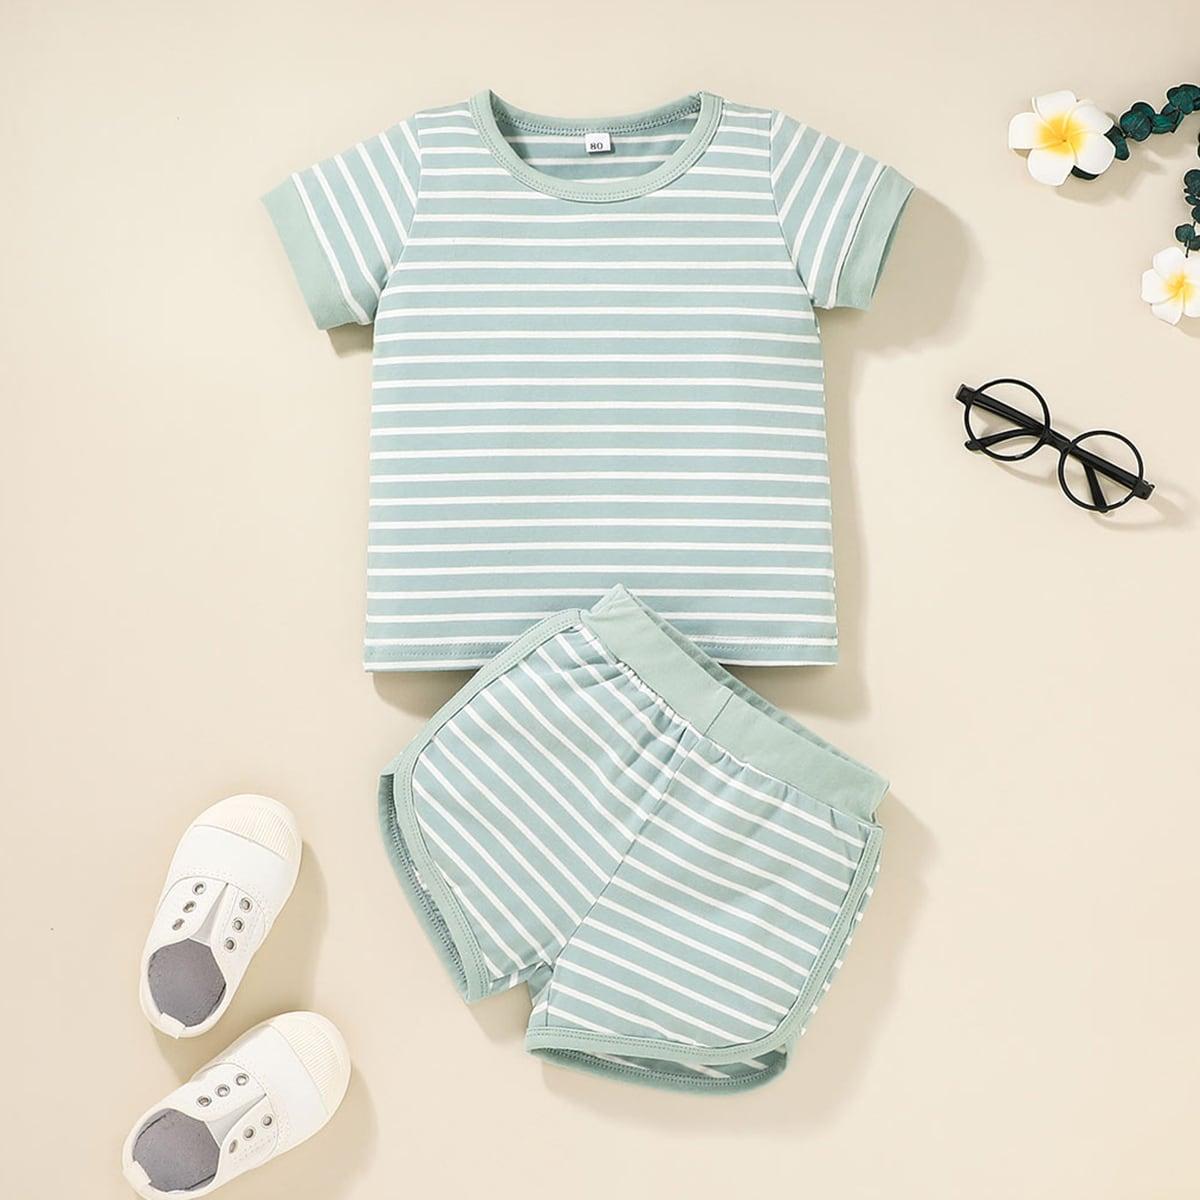 Baby Boy Striped Tee & Shorts